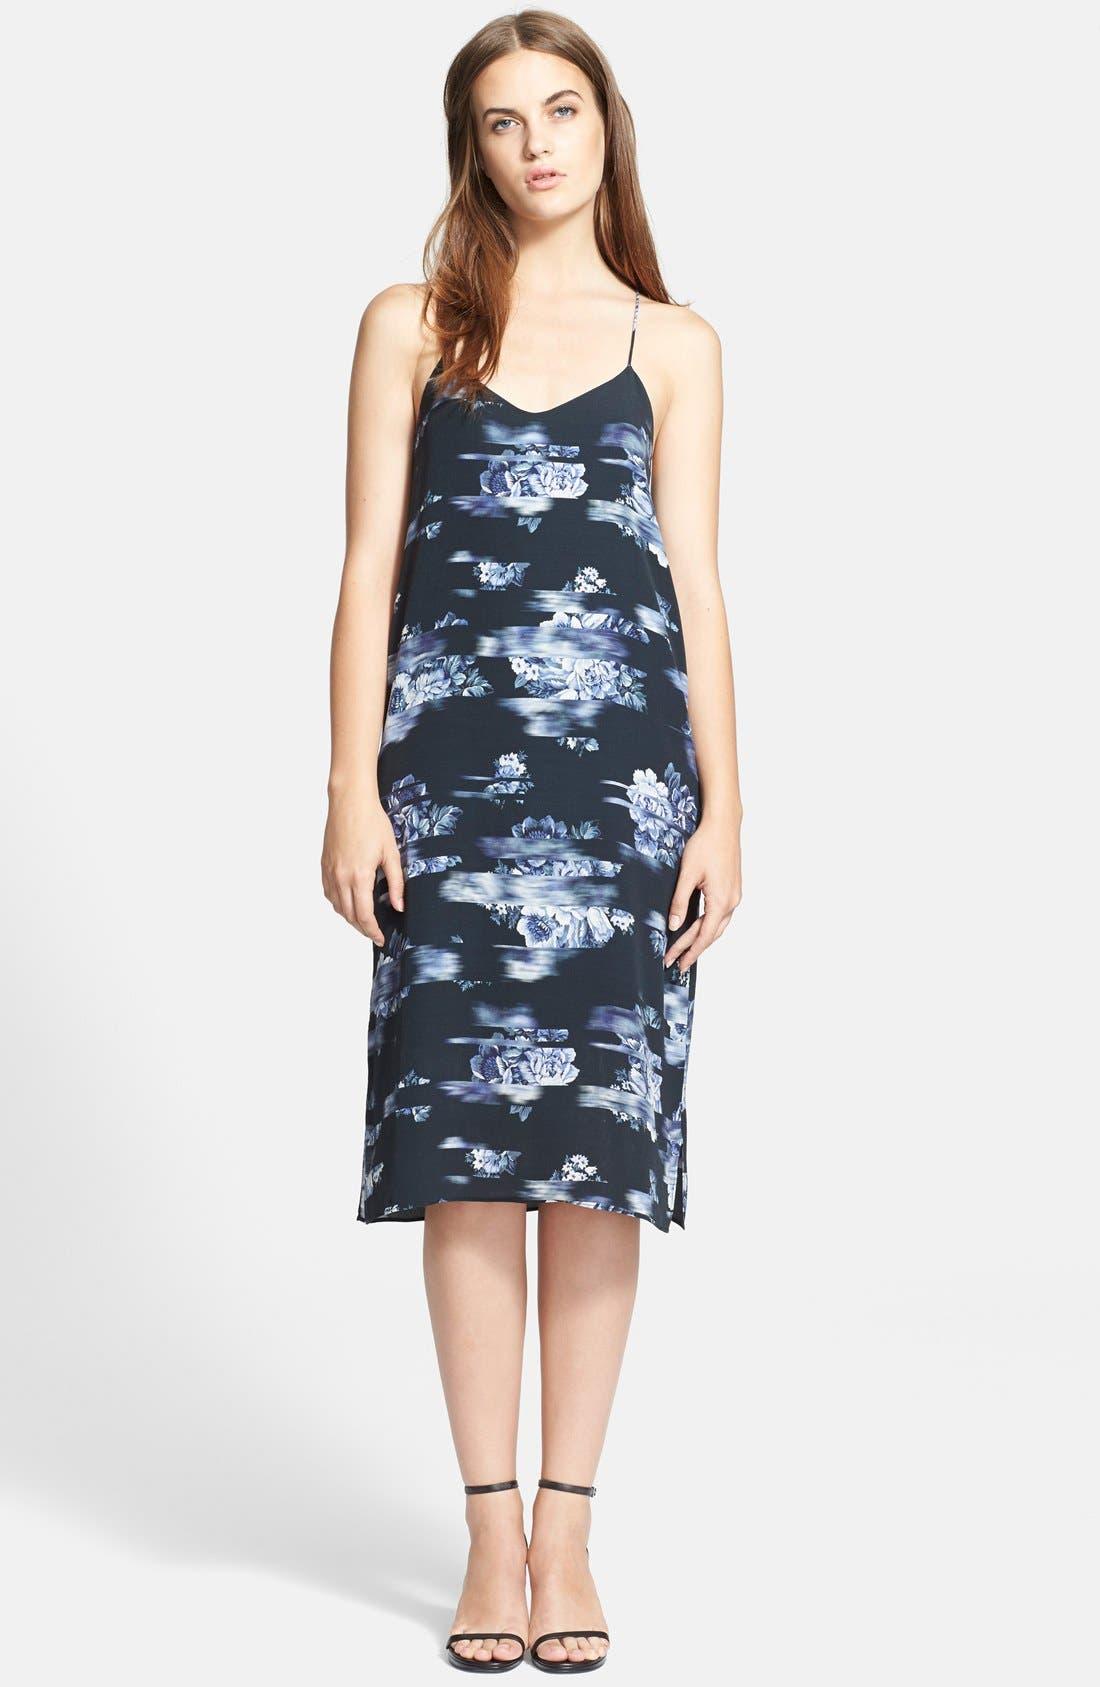 Alternate Image 1 Selected - Tibi 'Floreale' Slip Dress